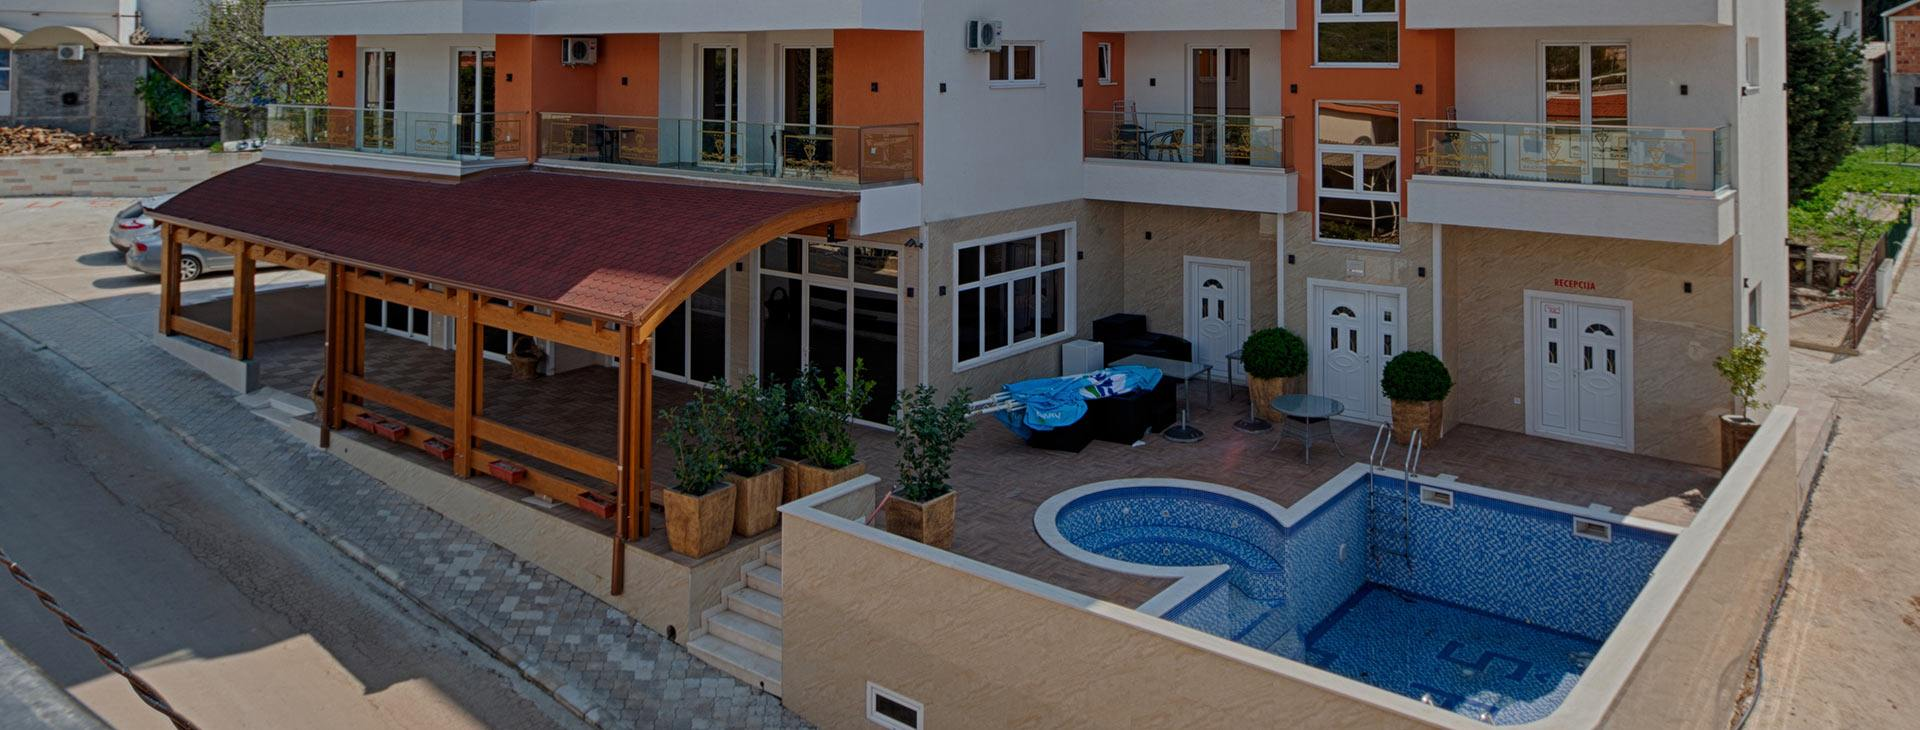 SARS Dobra Voda Czarnogóra, Riwiera Czarnogórska, Dobra Voda